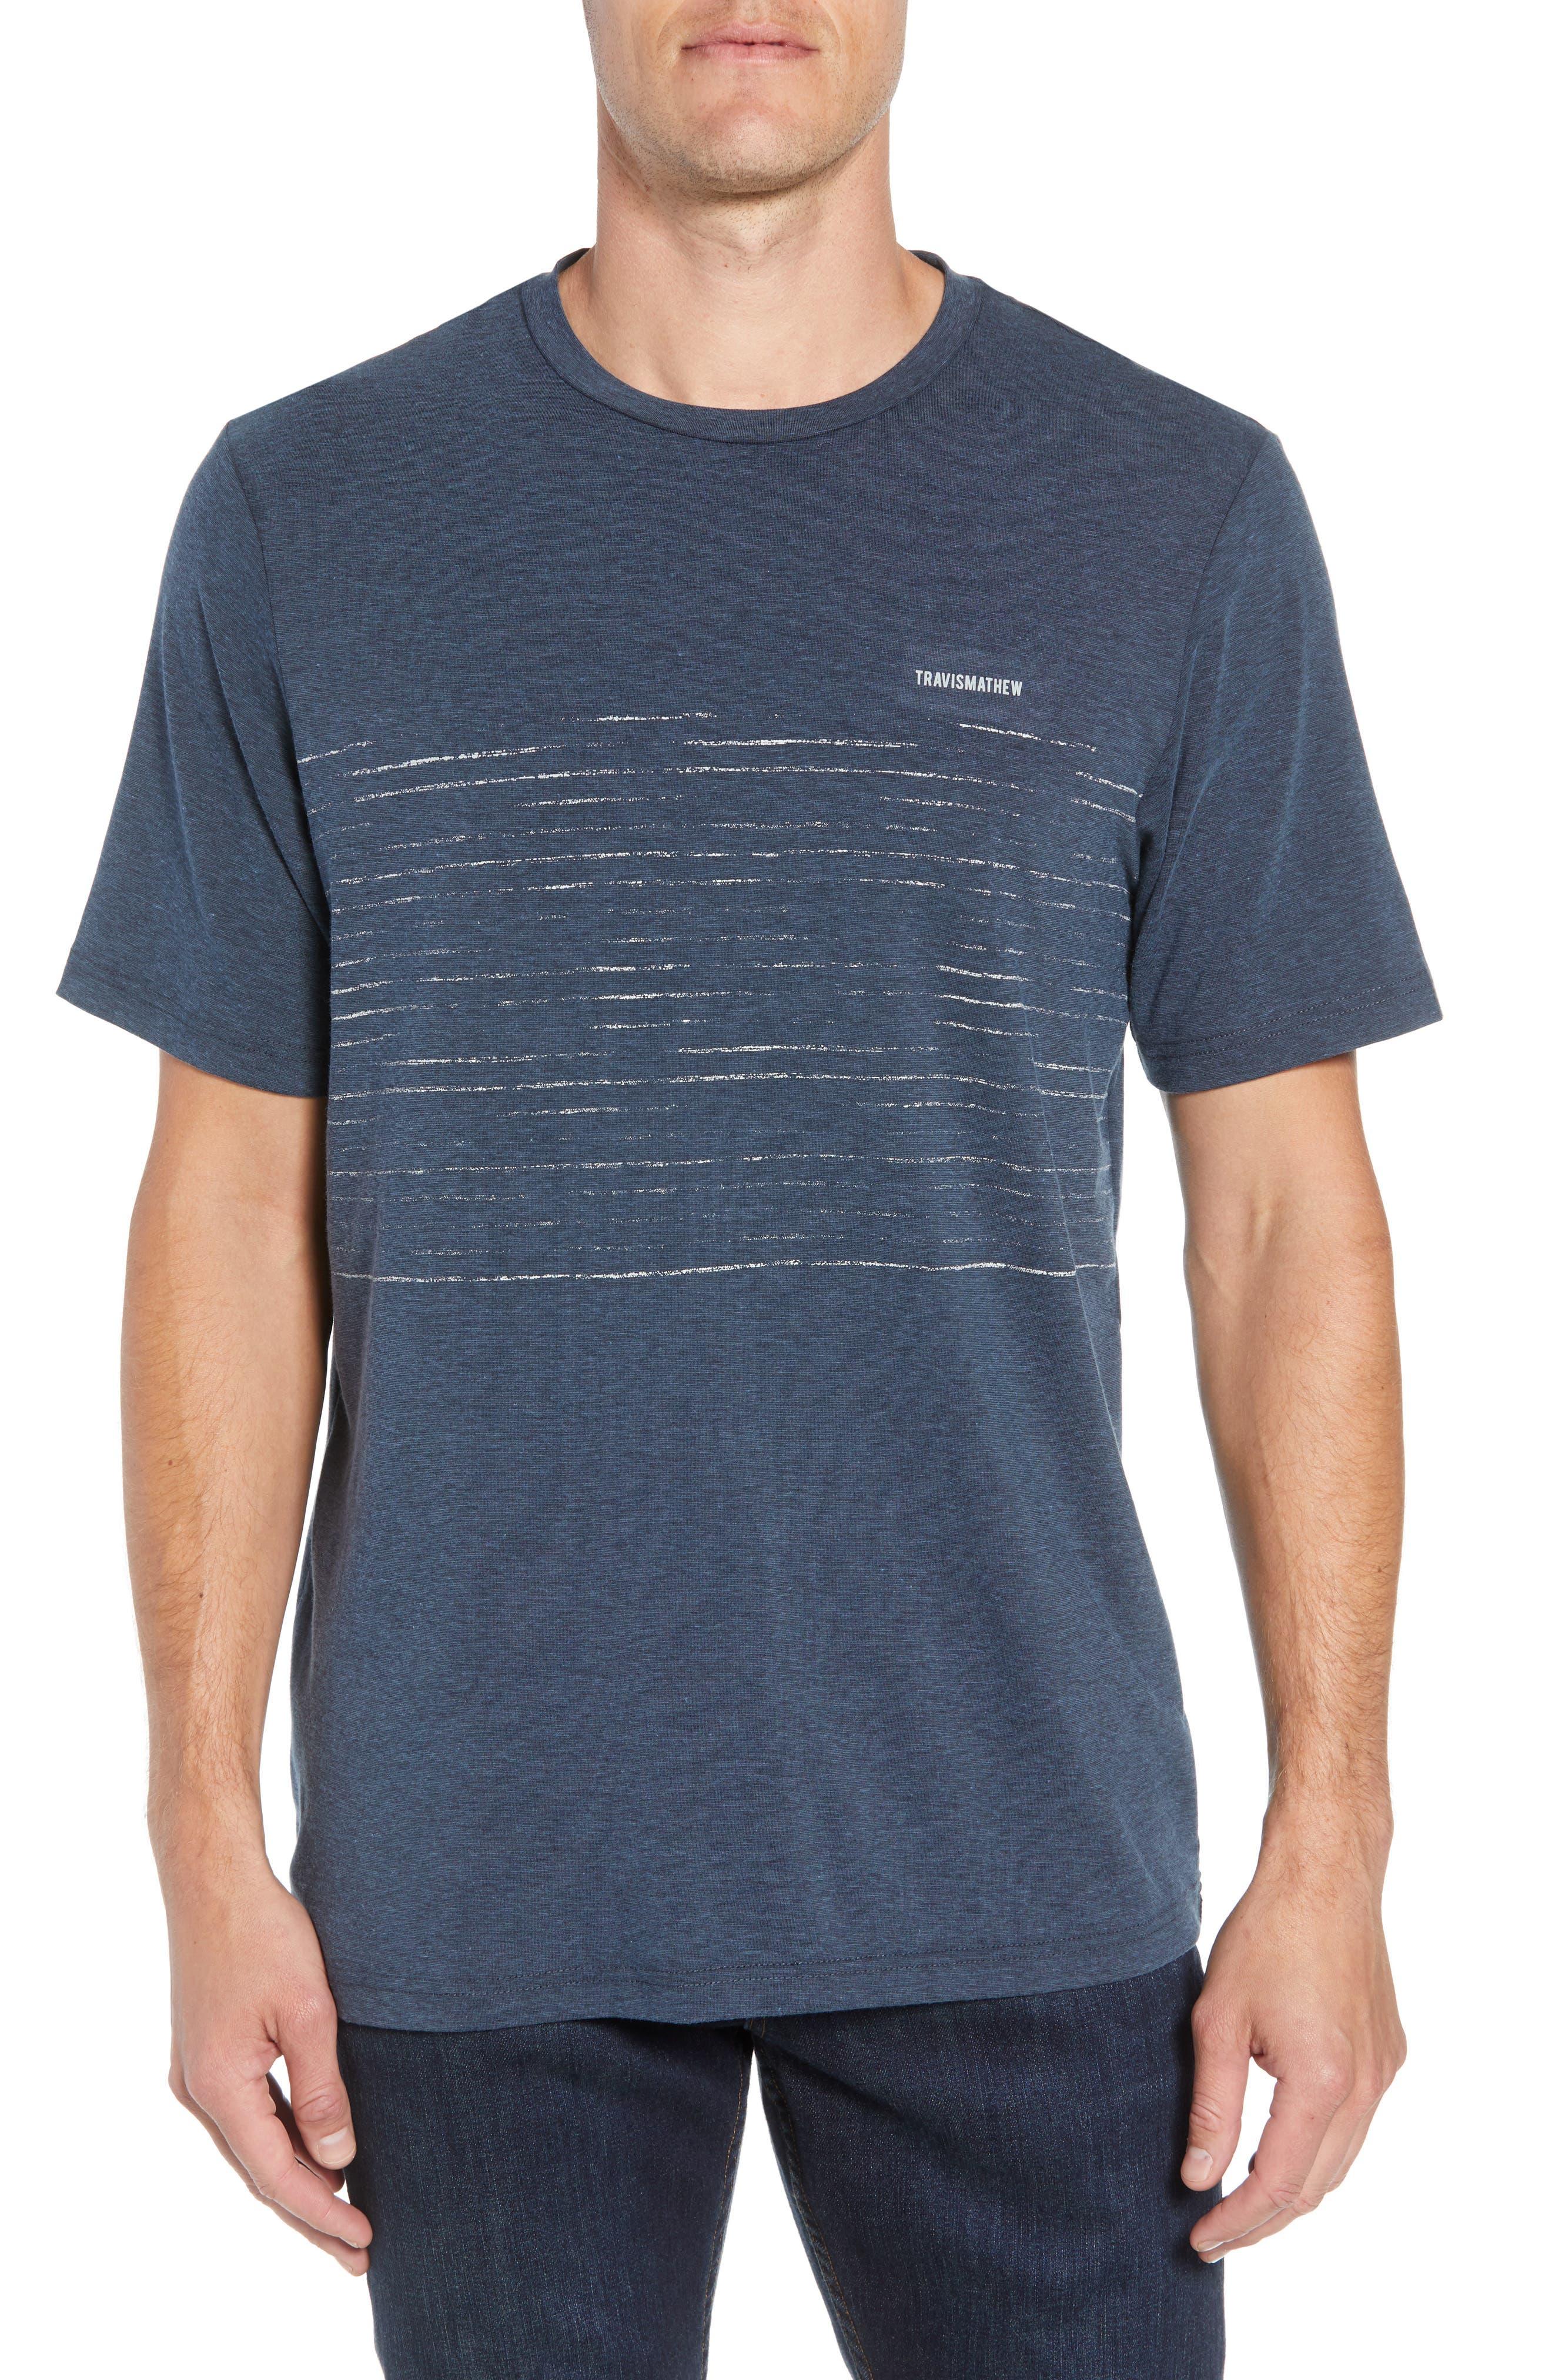 Laze T-Shirt,                         Main,                         color, TRUE NAVY/ BLACK